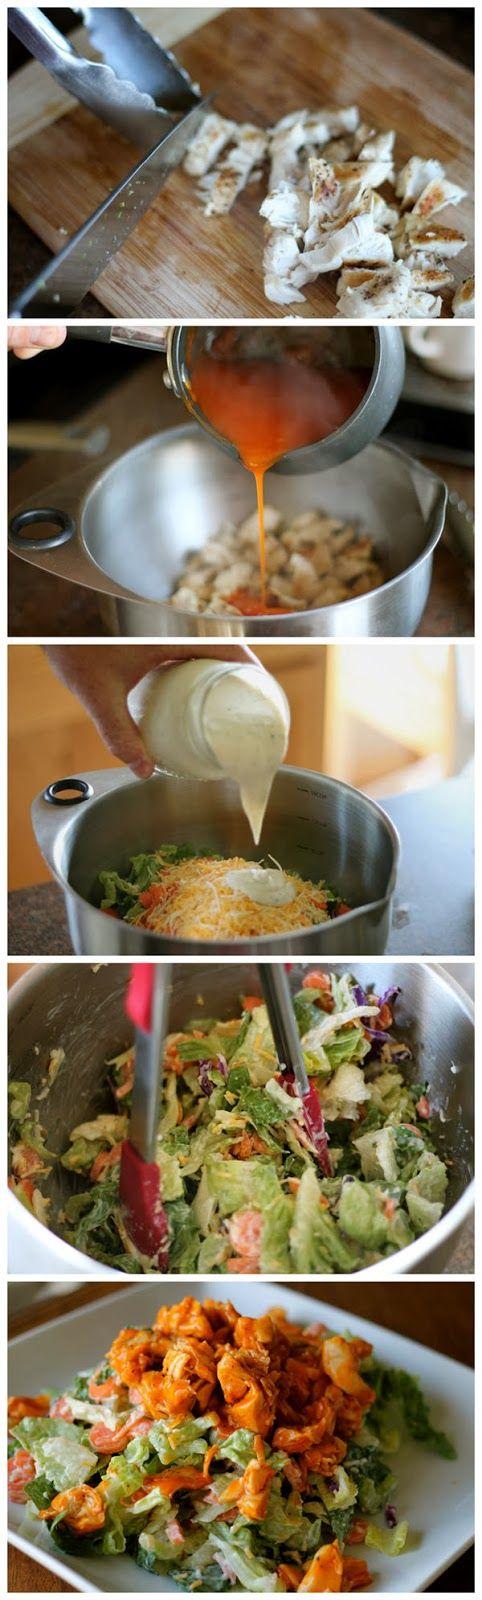 Best Food Cloud: Chopped Buffalo Chicken Salad